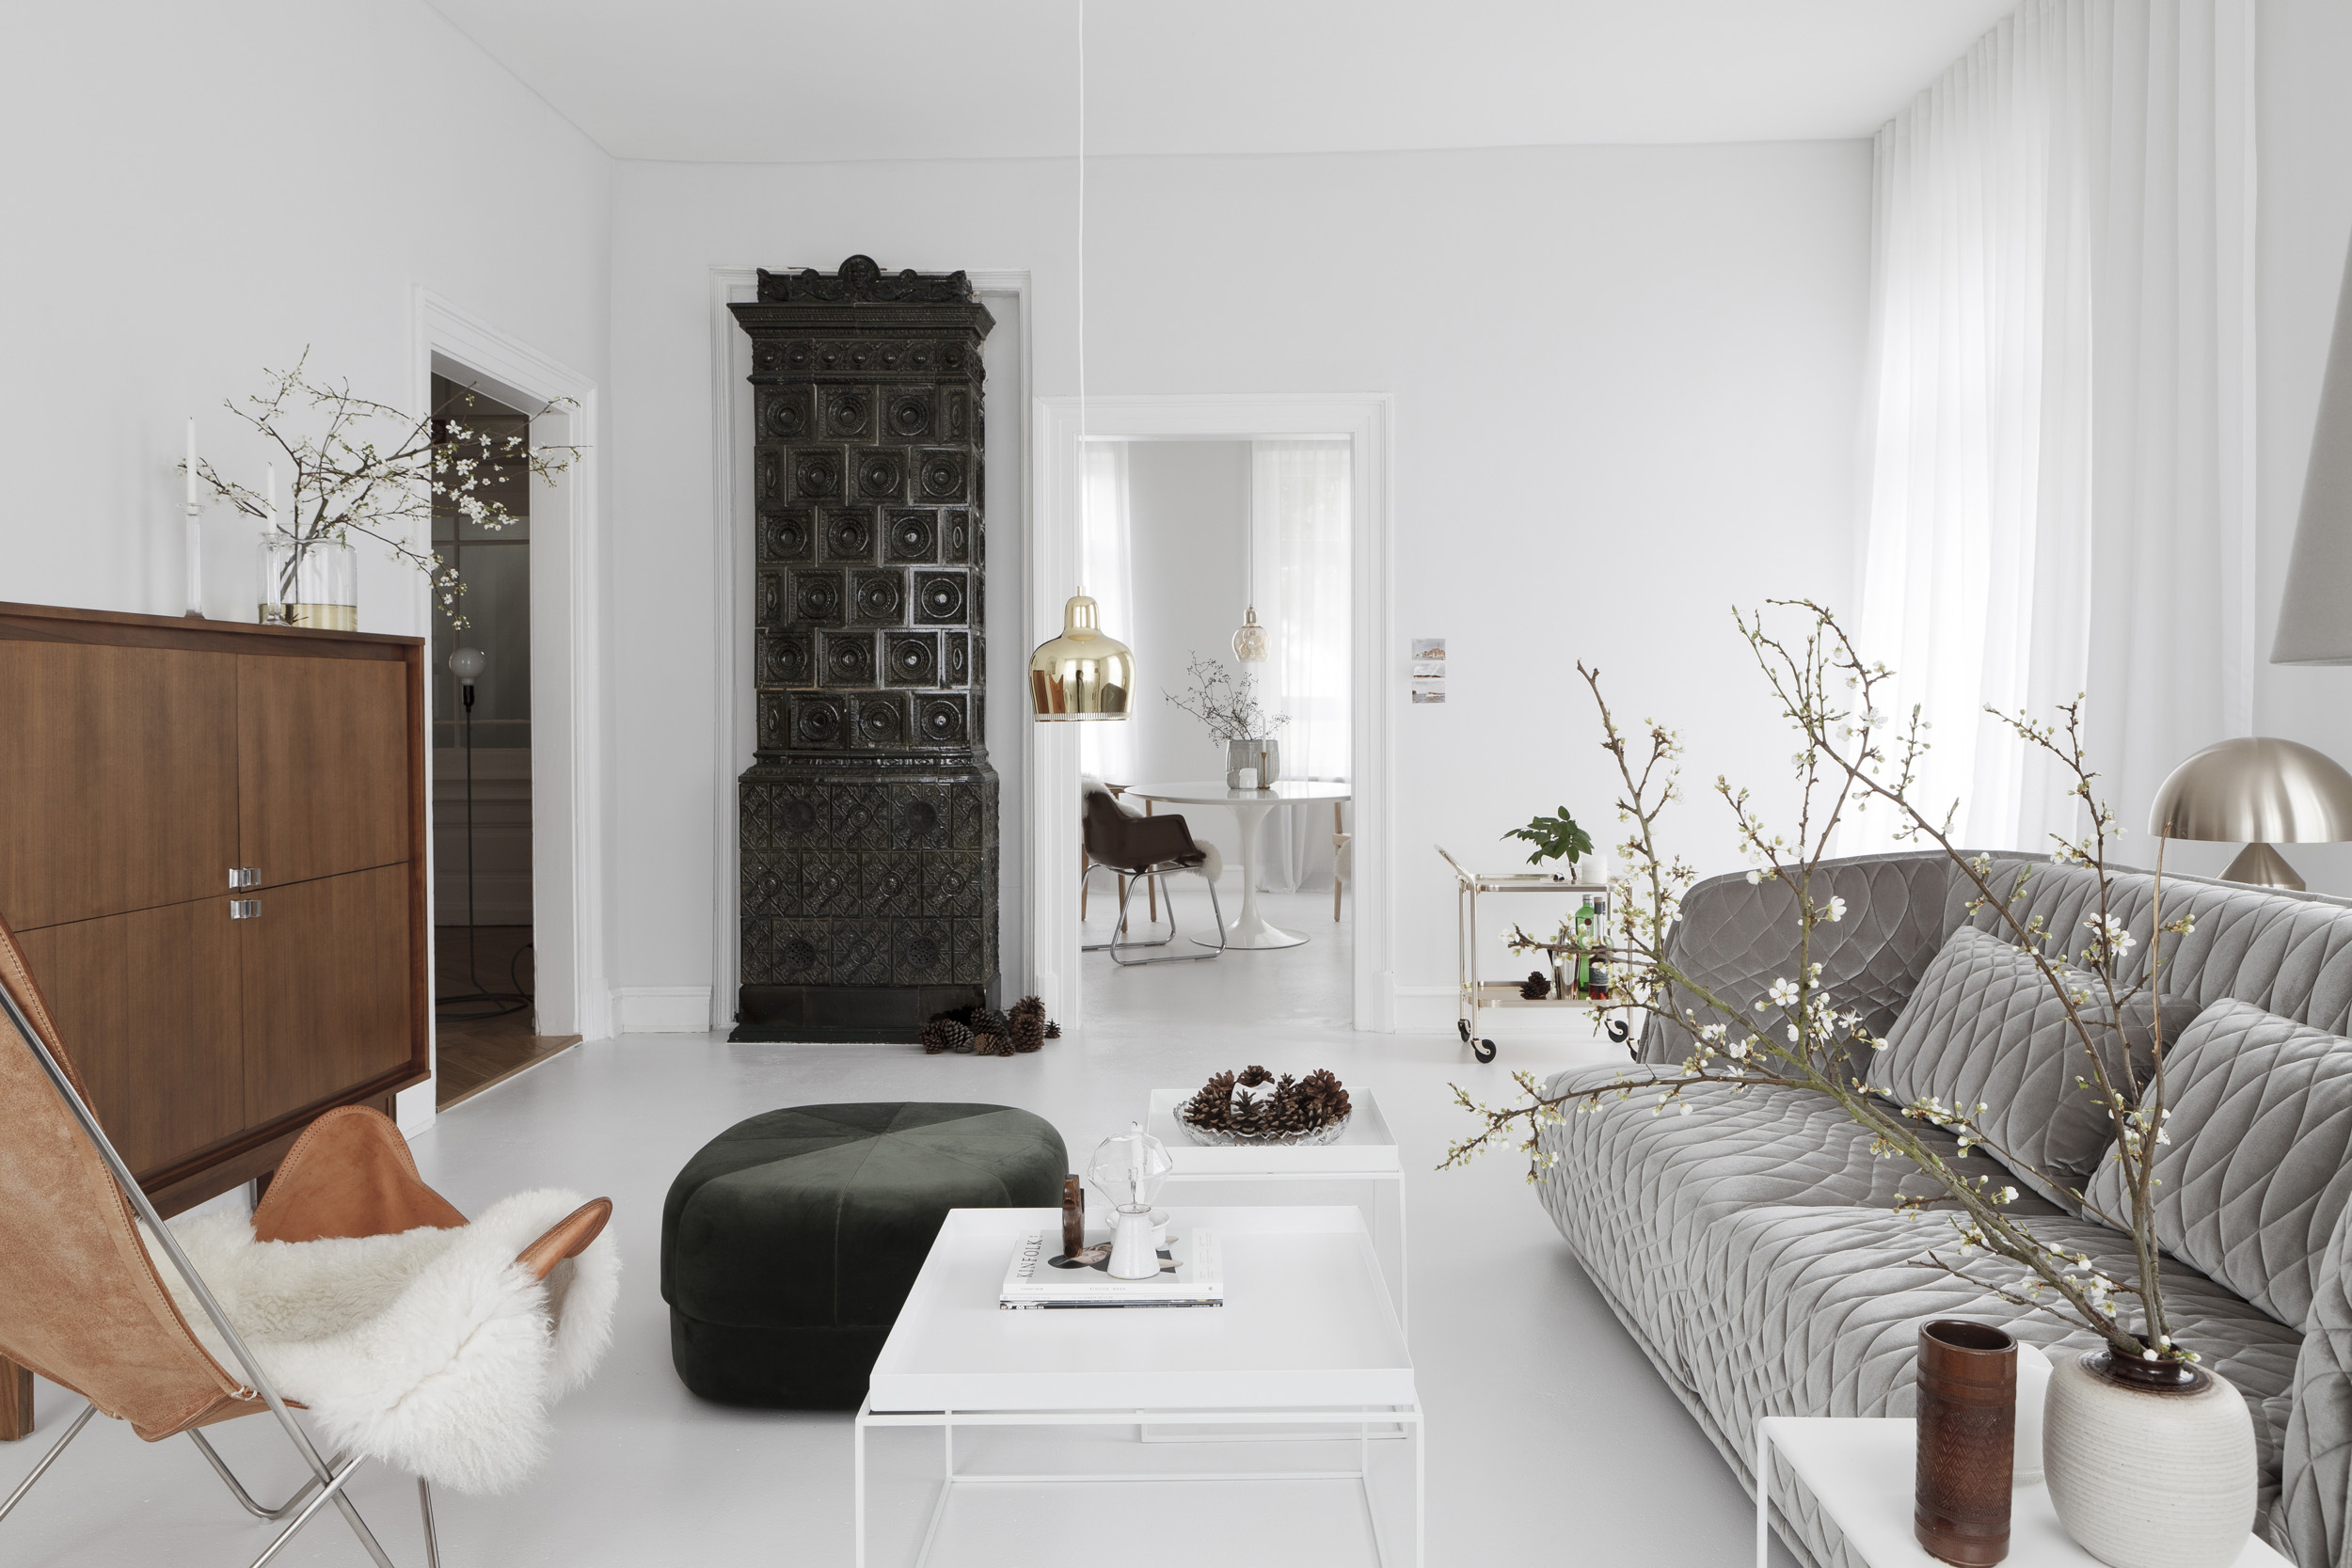 Studio-Oink-House-Cal-II-apartment-remodel-Mainz-Germany-Remodelista-1E.jpg